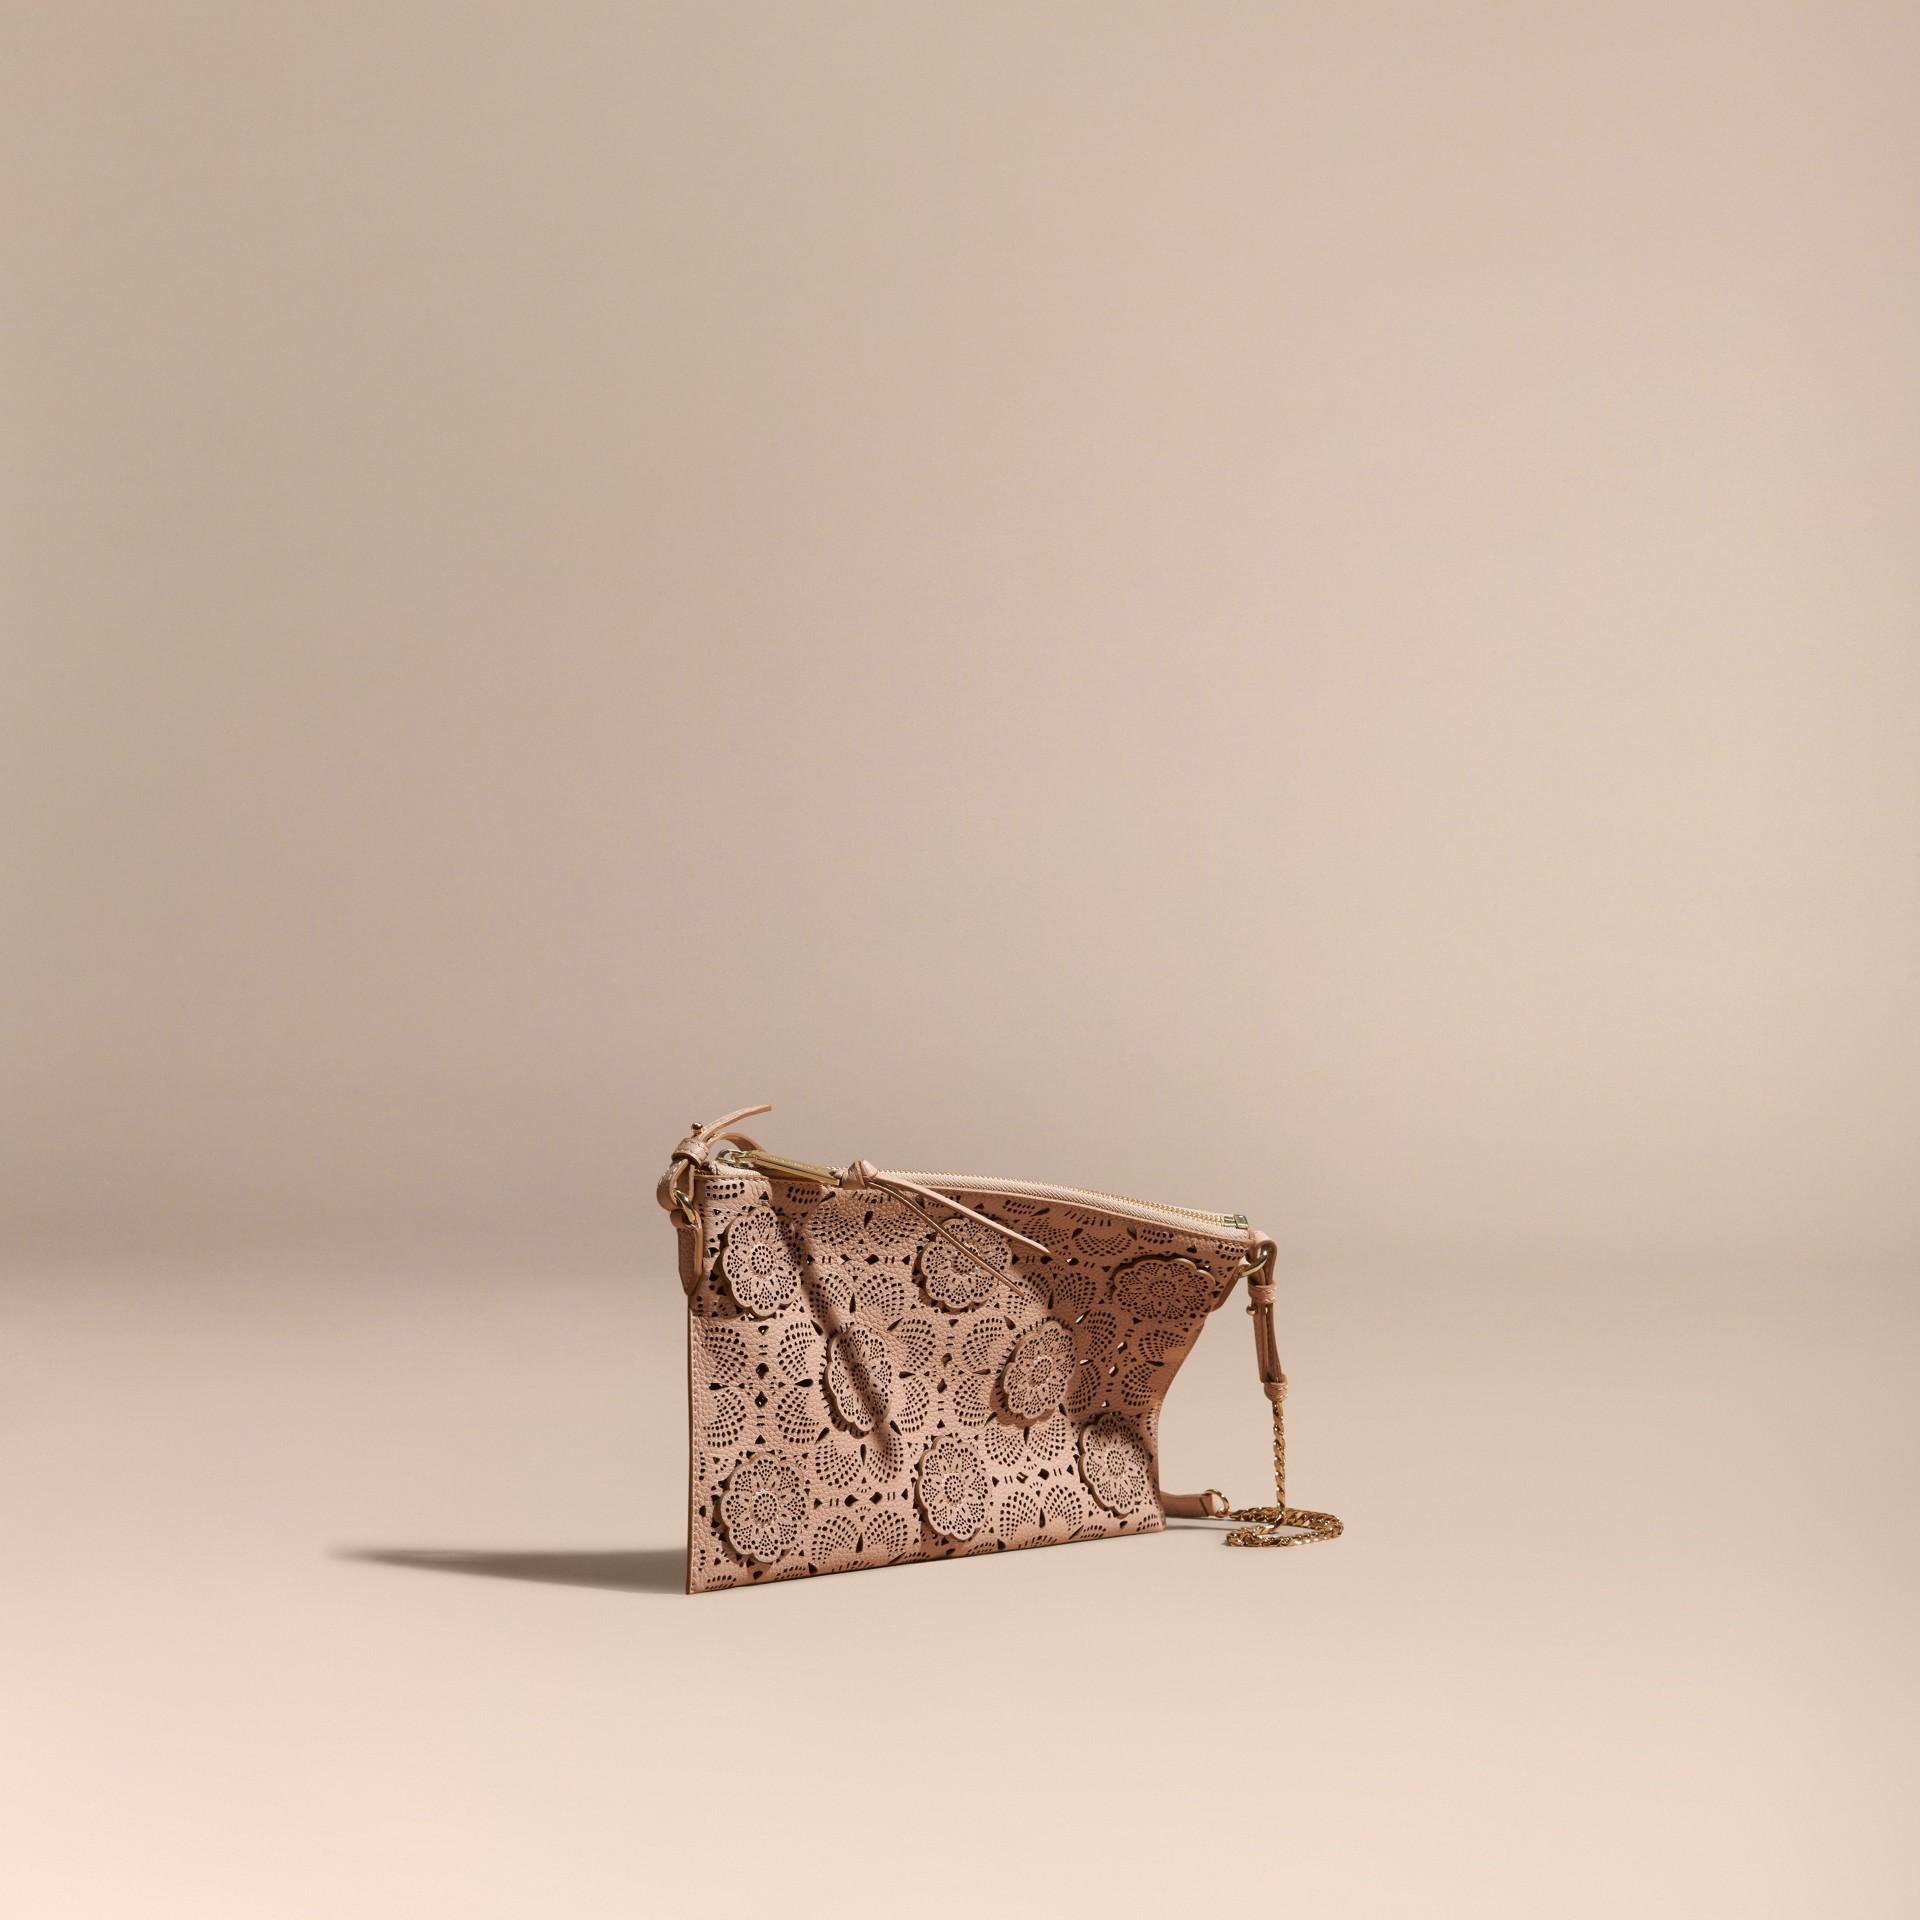 Pale apricot Laser-cut Floral Lace Leather Clutch Bag Pale Apricot - gallery image 1